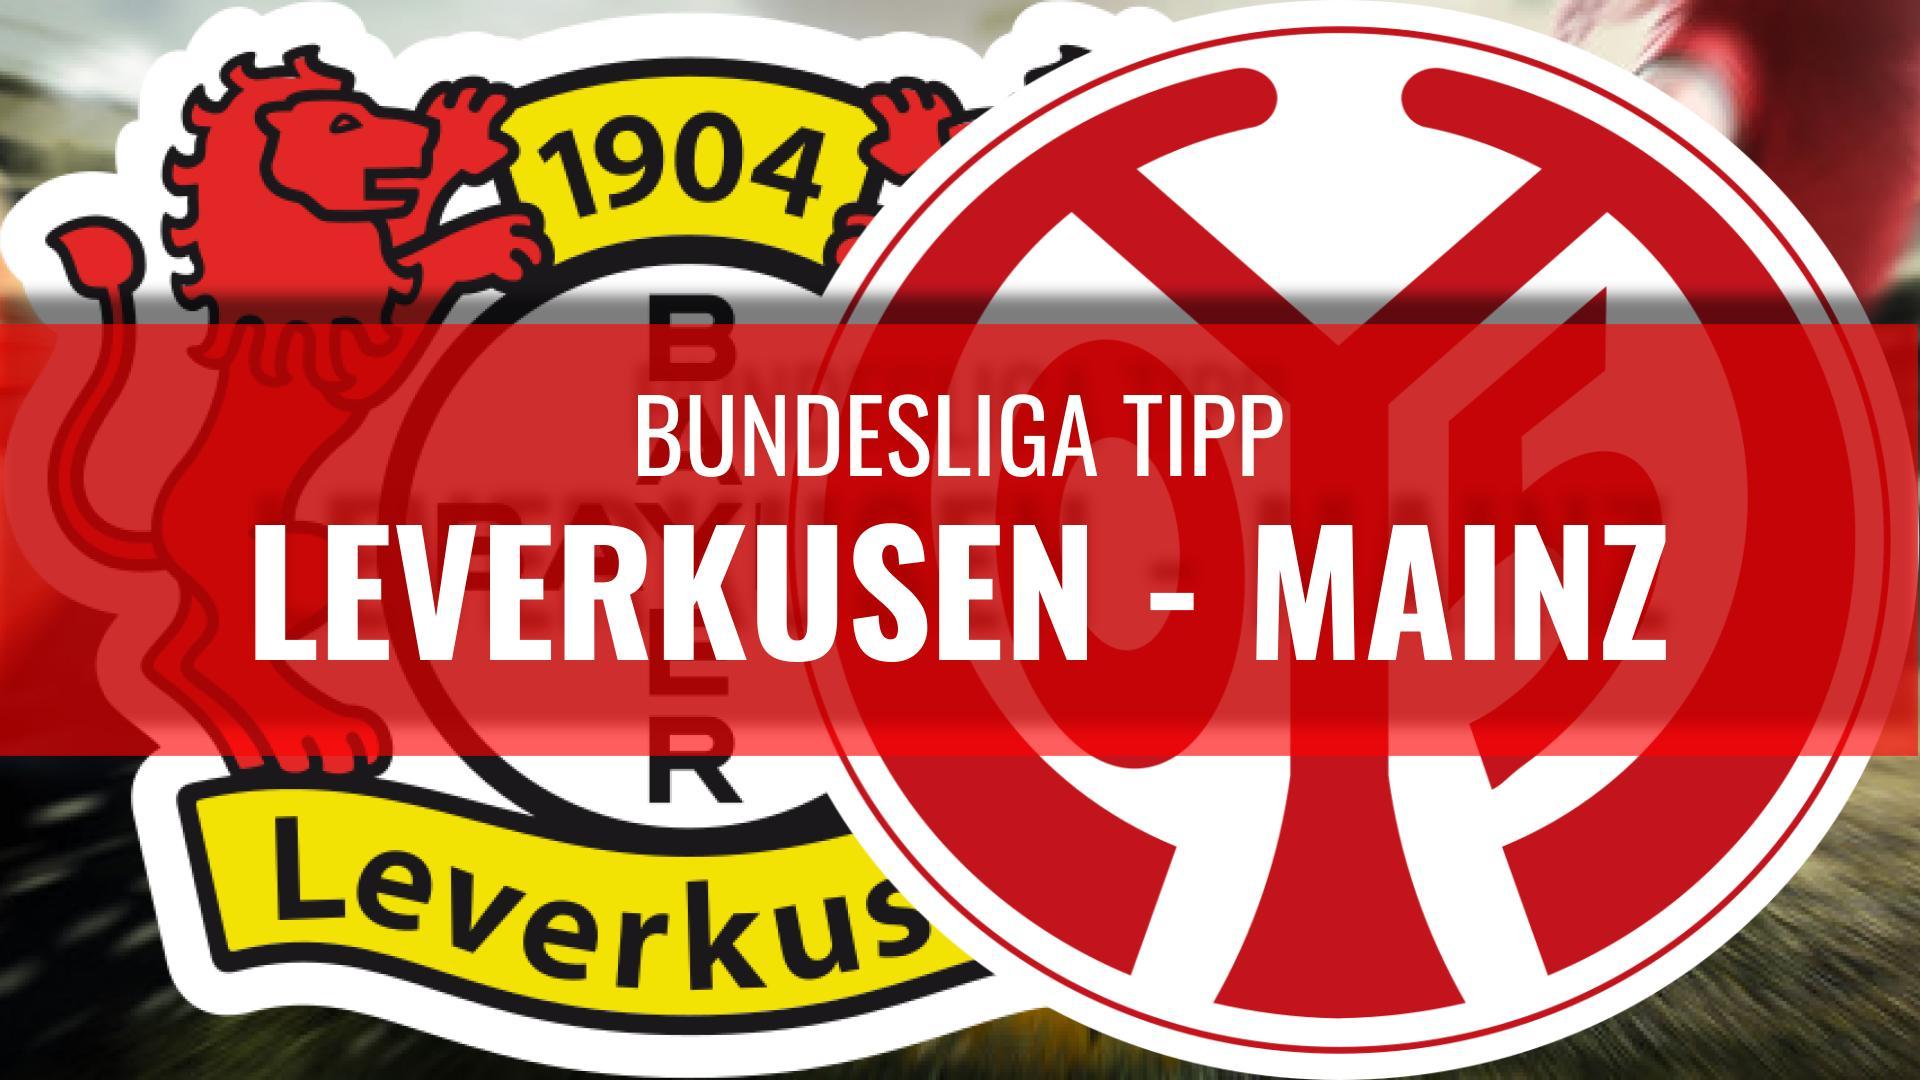 LEVERKUSEN - MAINZ-Bundesliga-Wett-Tipps-21